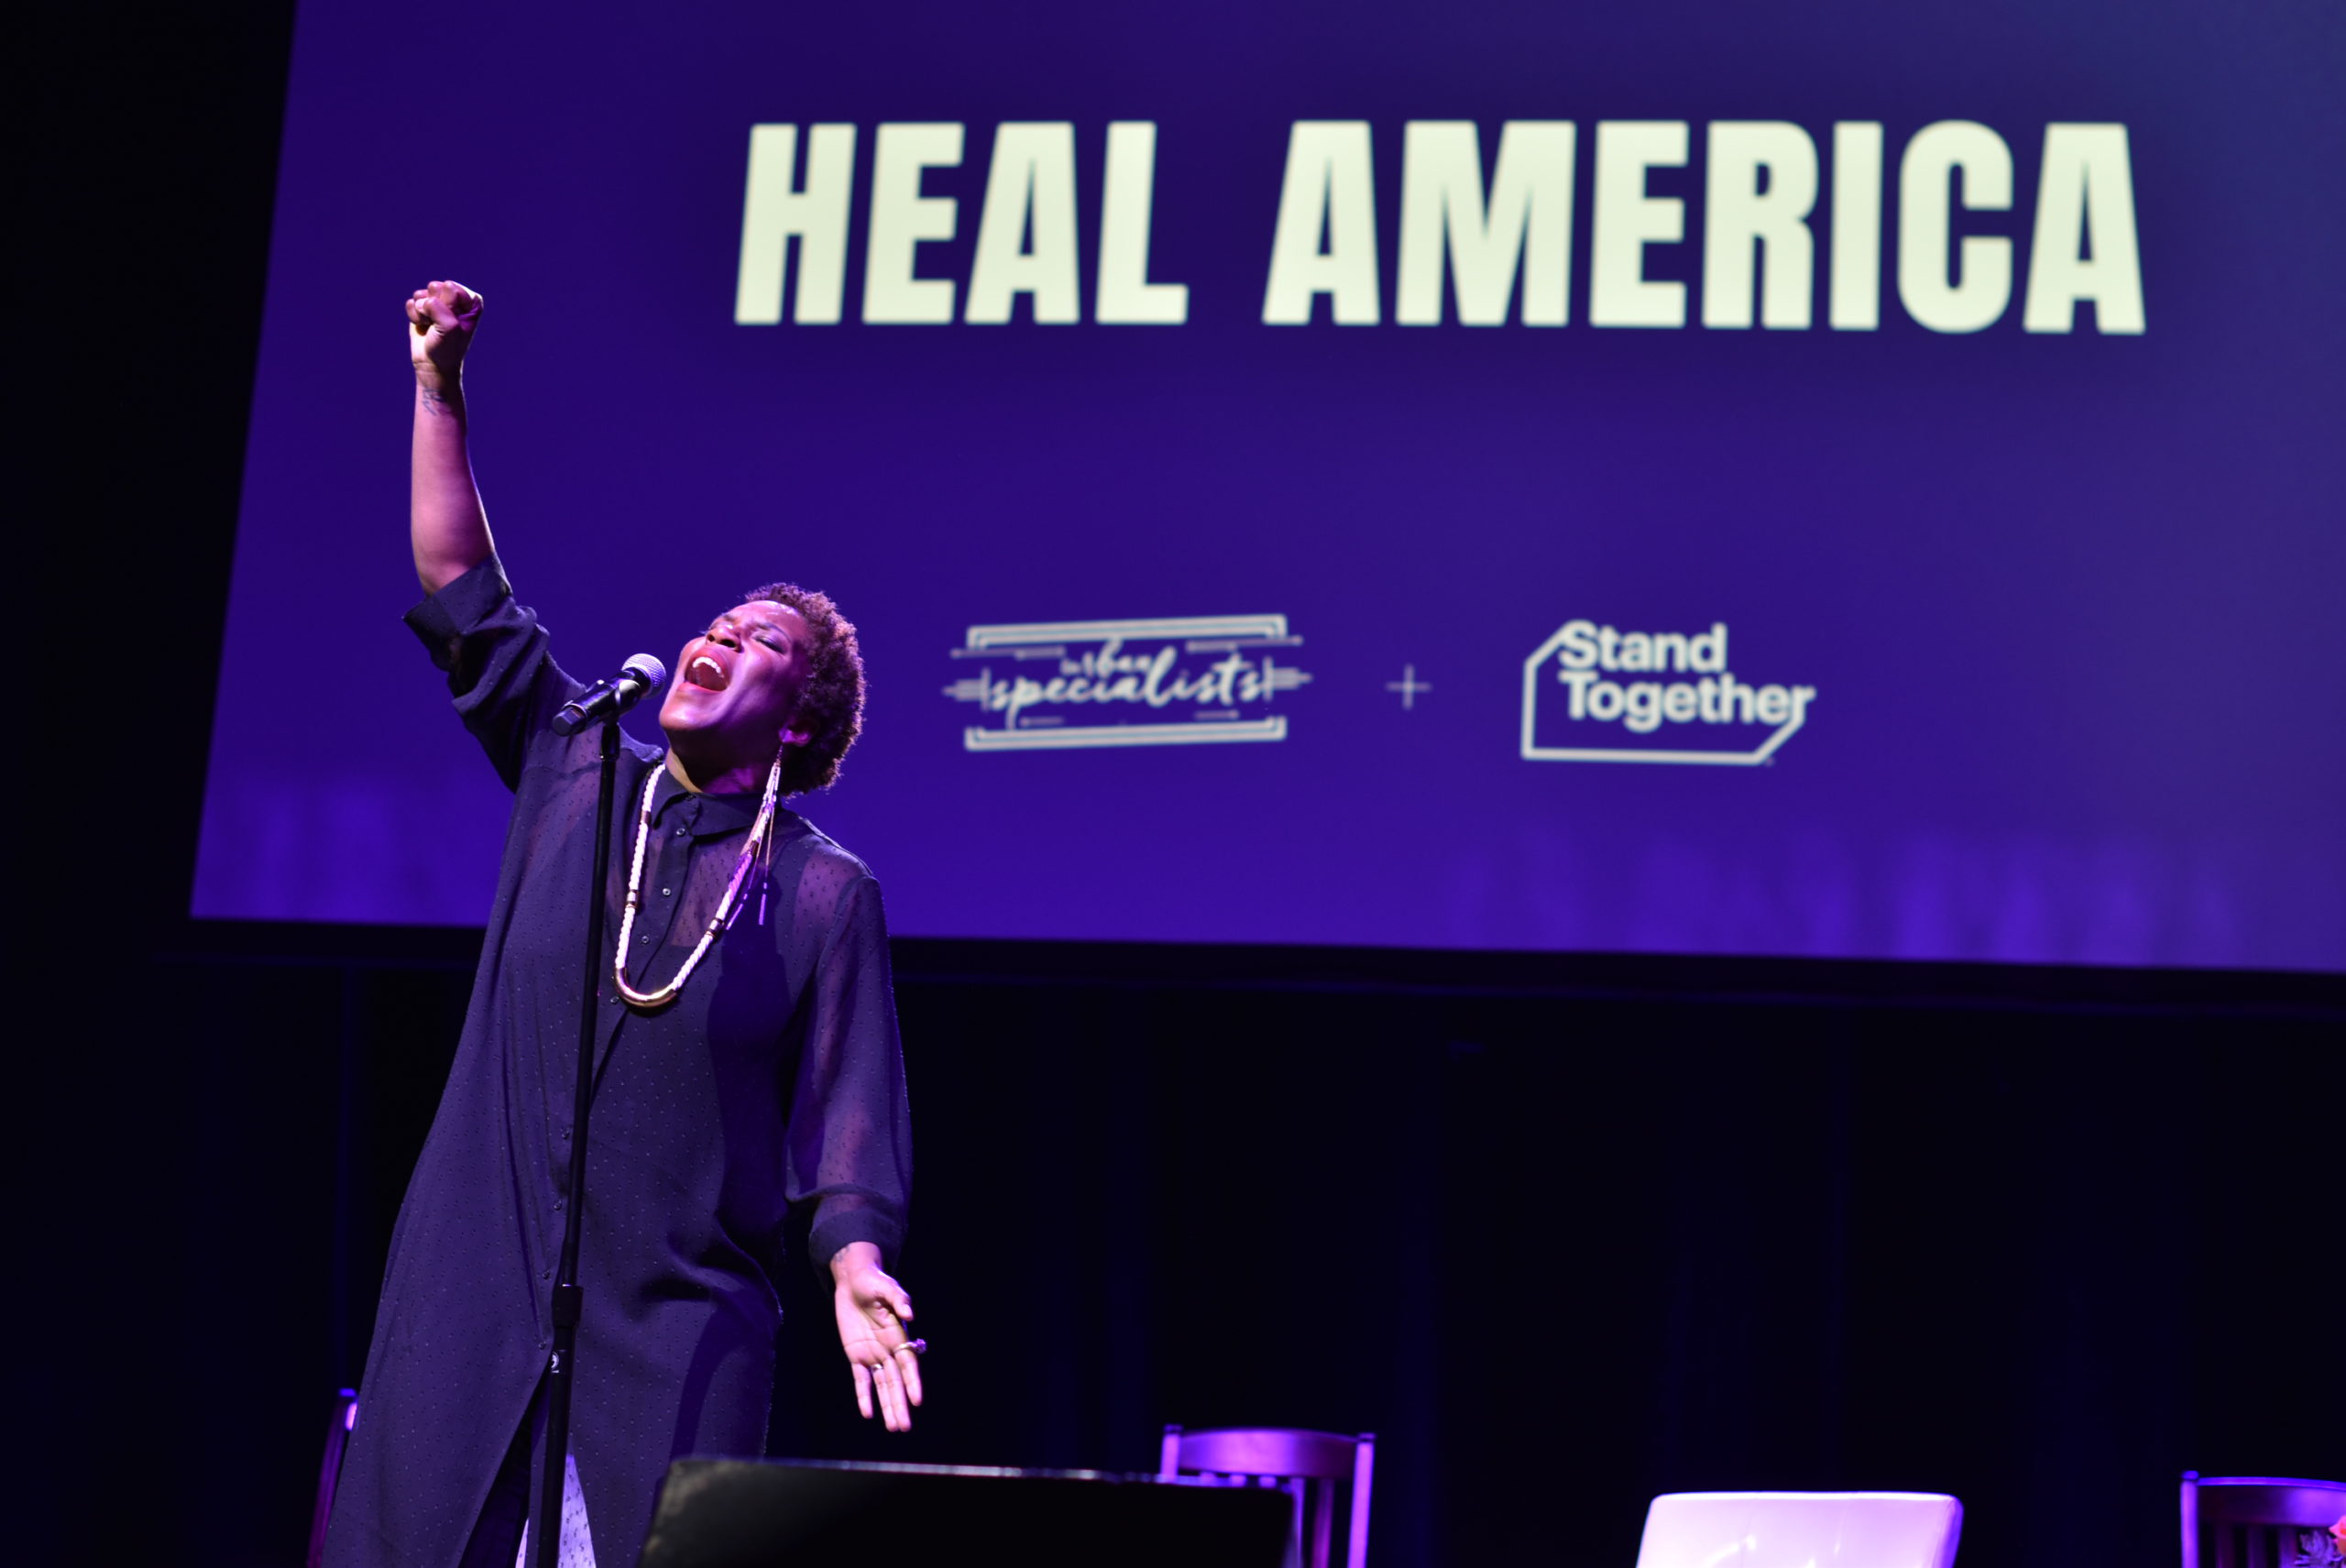 Instagram – Liv Warfield on Heal America